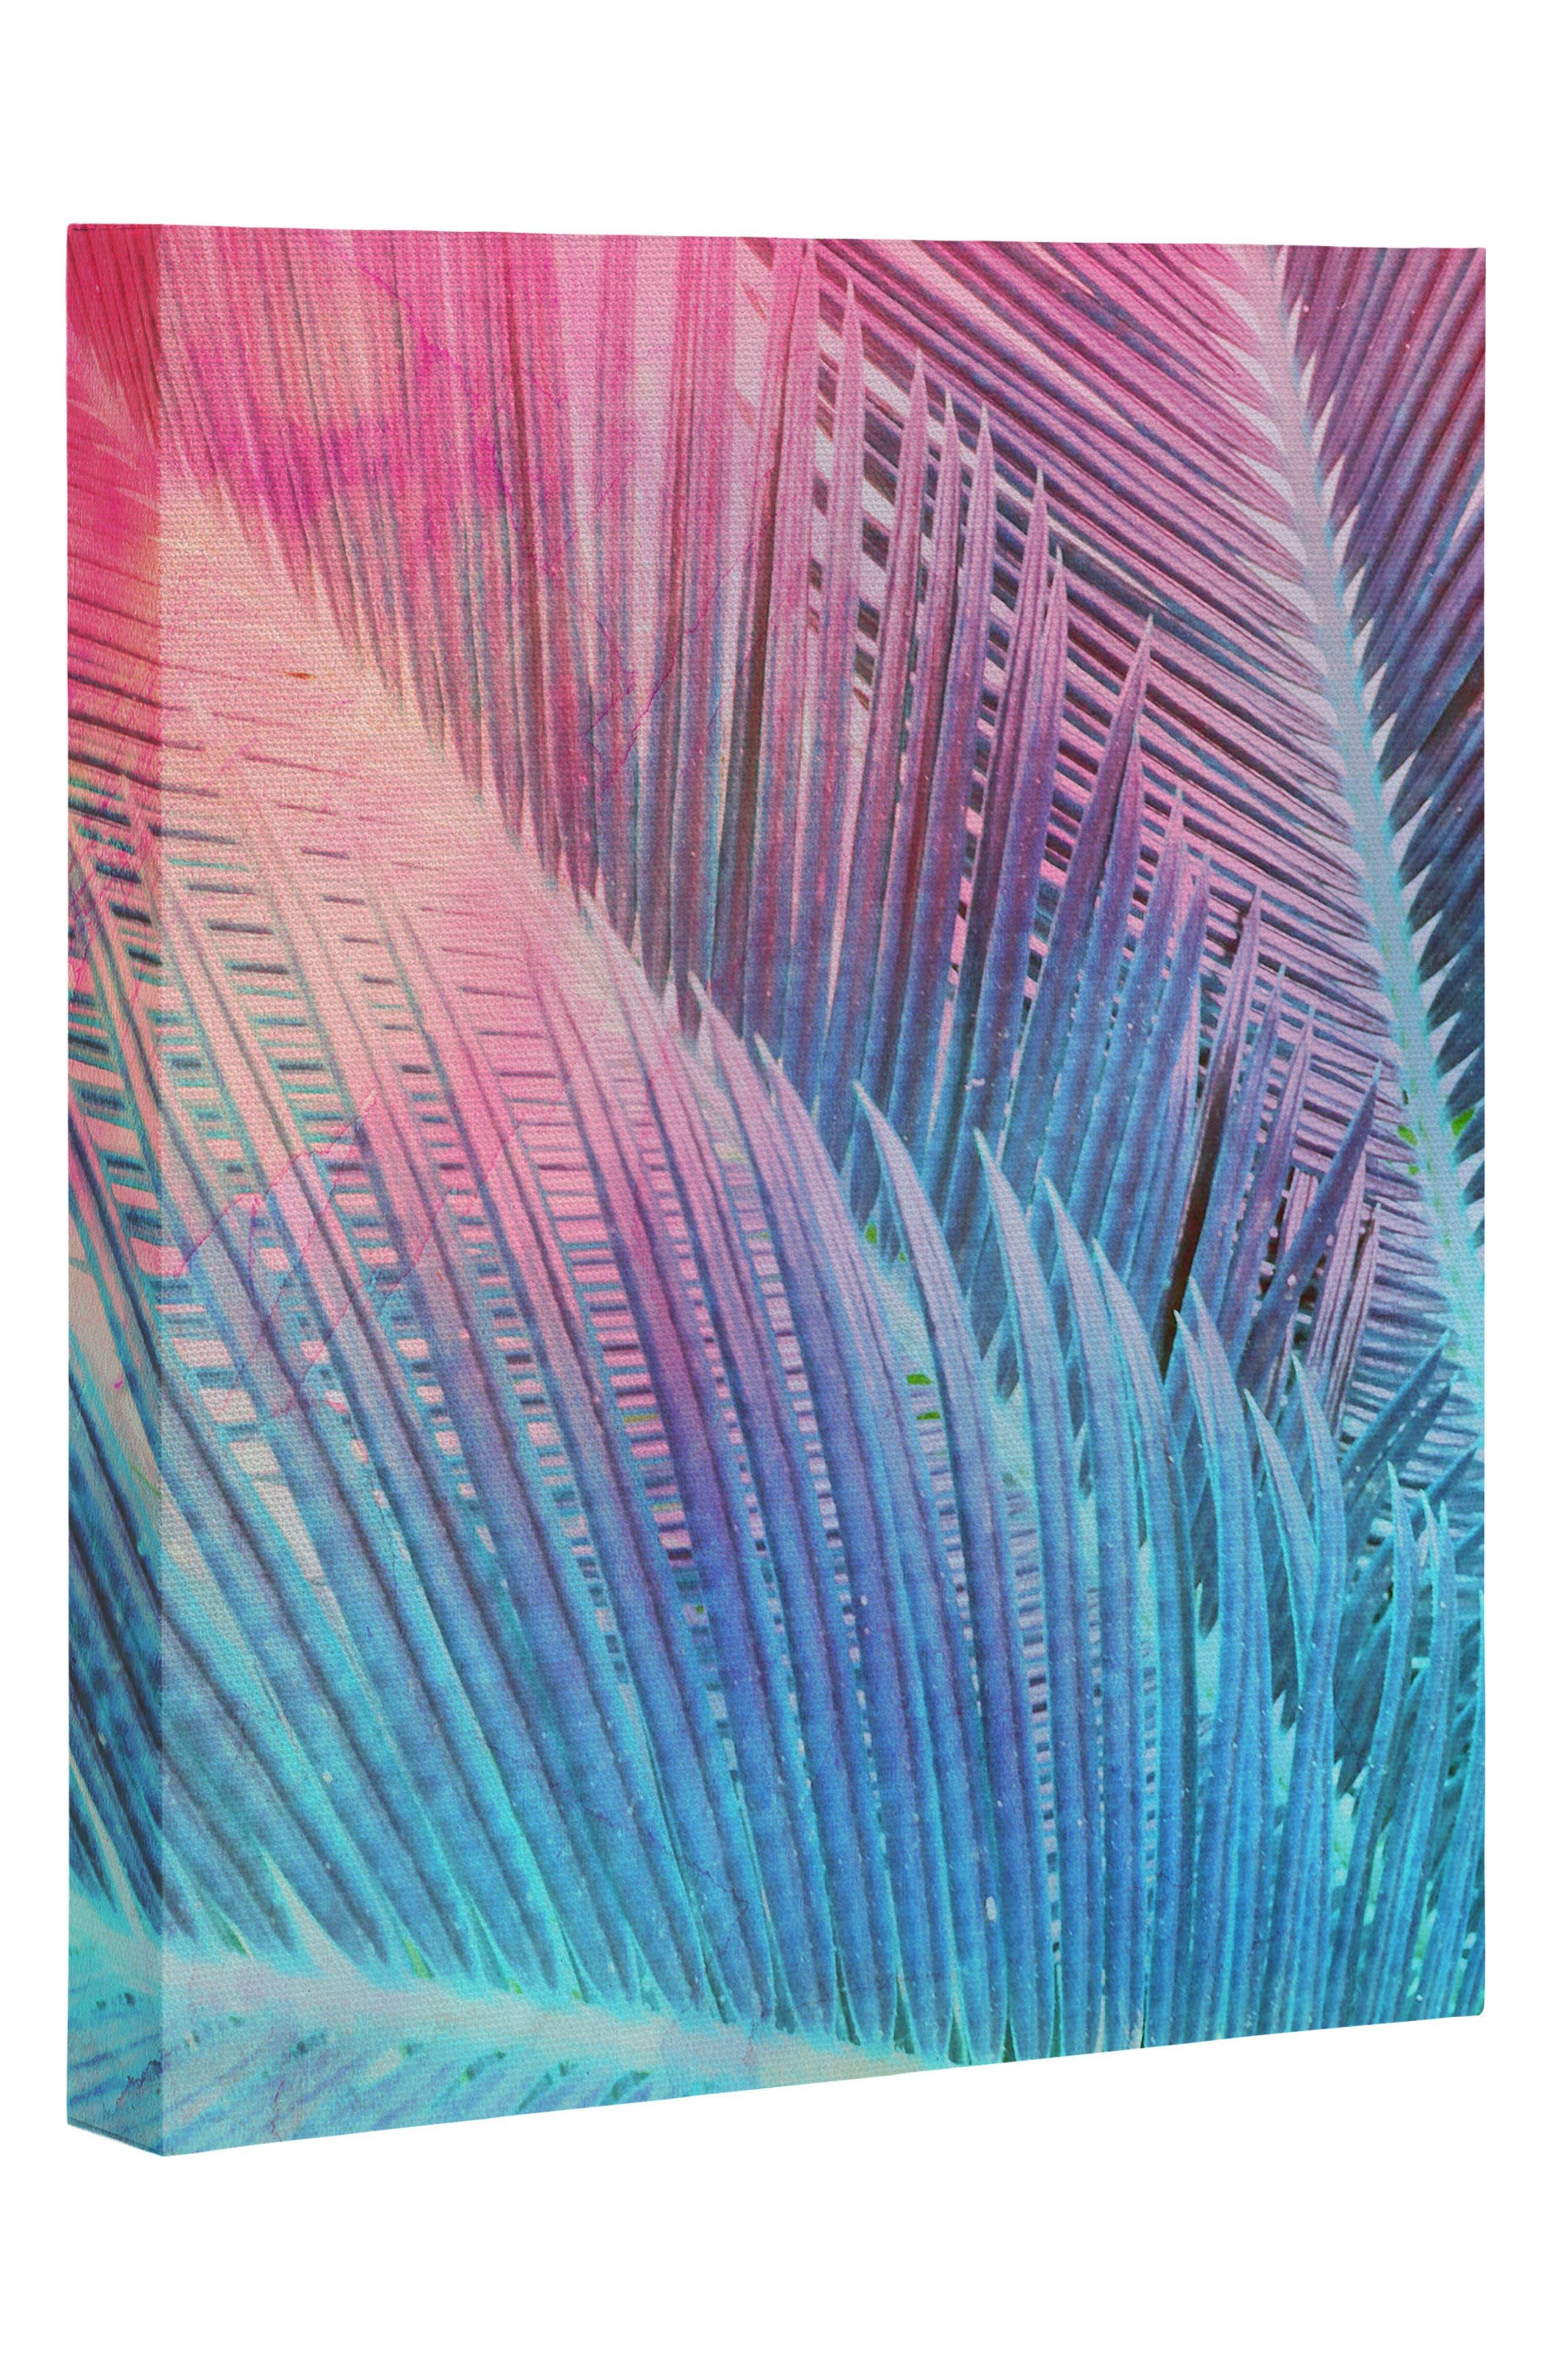 Deny Designs Palm 1 Canvas Wall Art